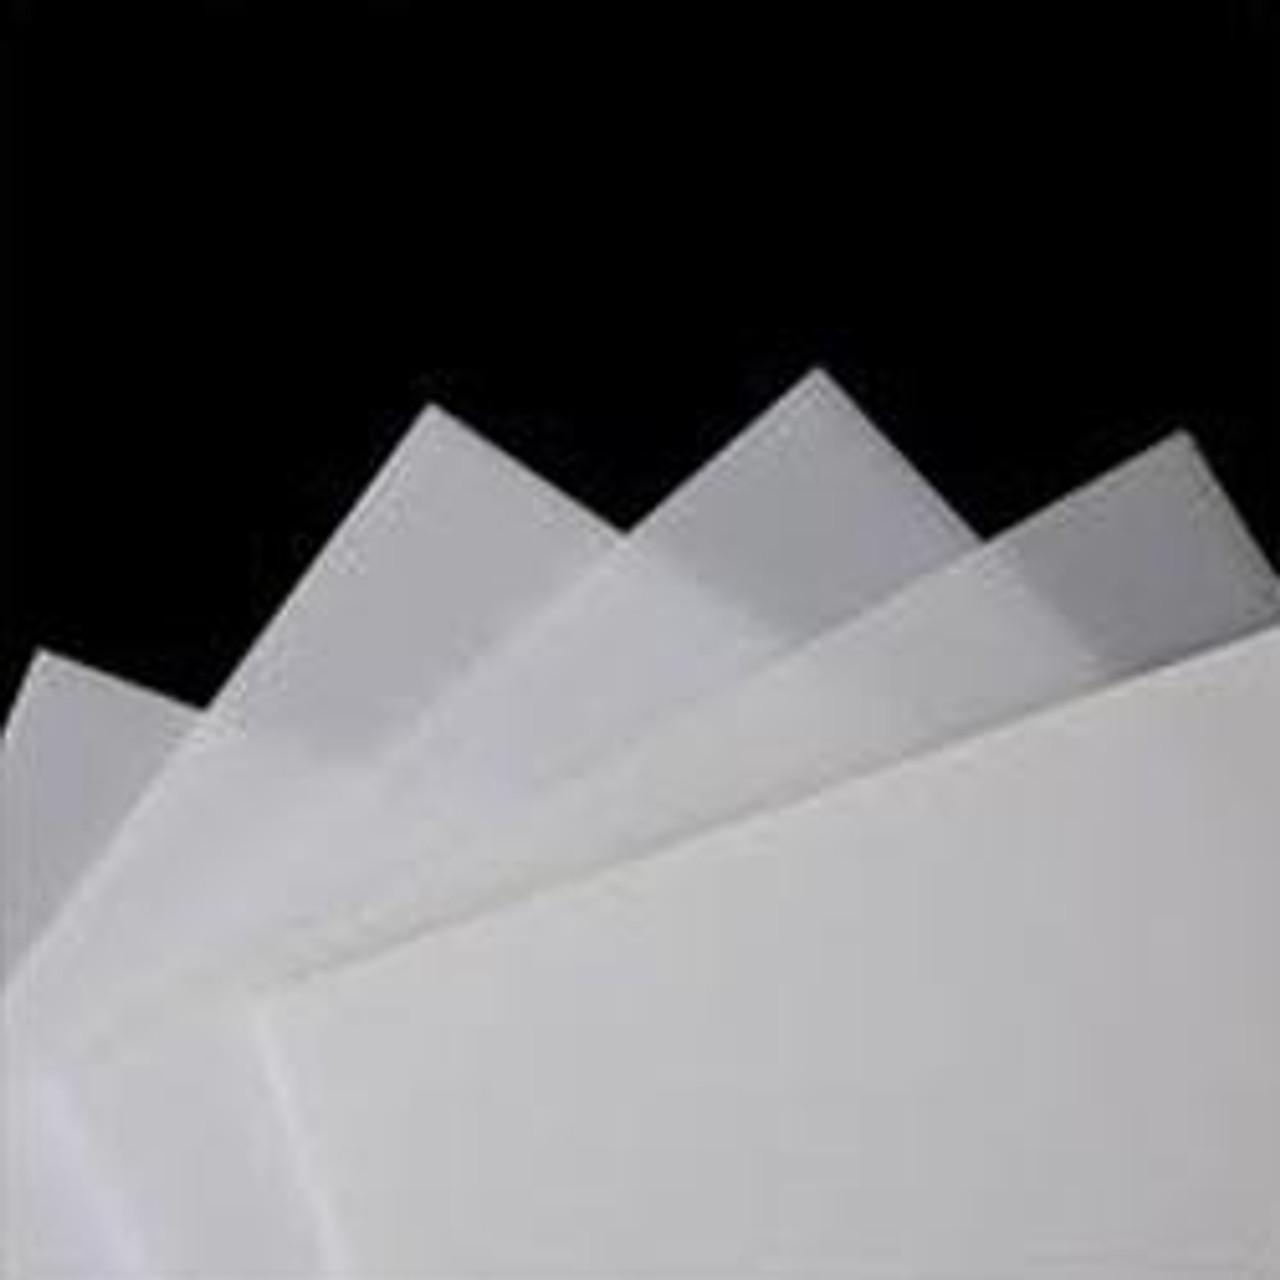 "4' x 8' x 1/8"" Translucent White Acrylic Sheet 2 sides Glossy, Plexi"